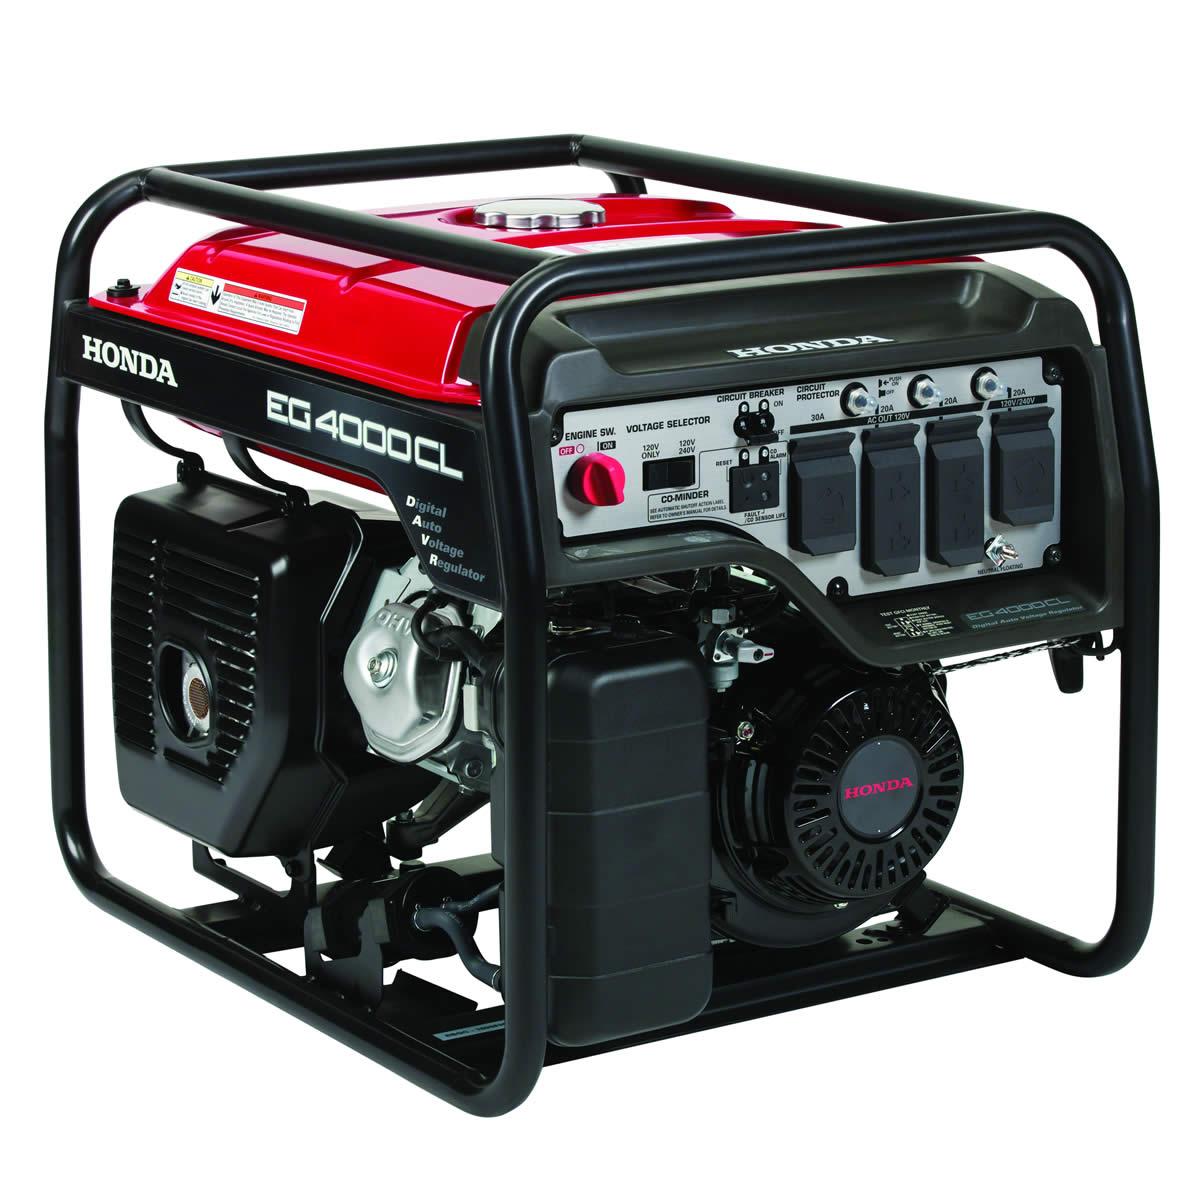 EG4000 with CO-MINDER™